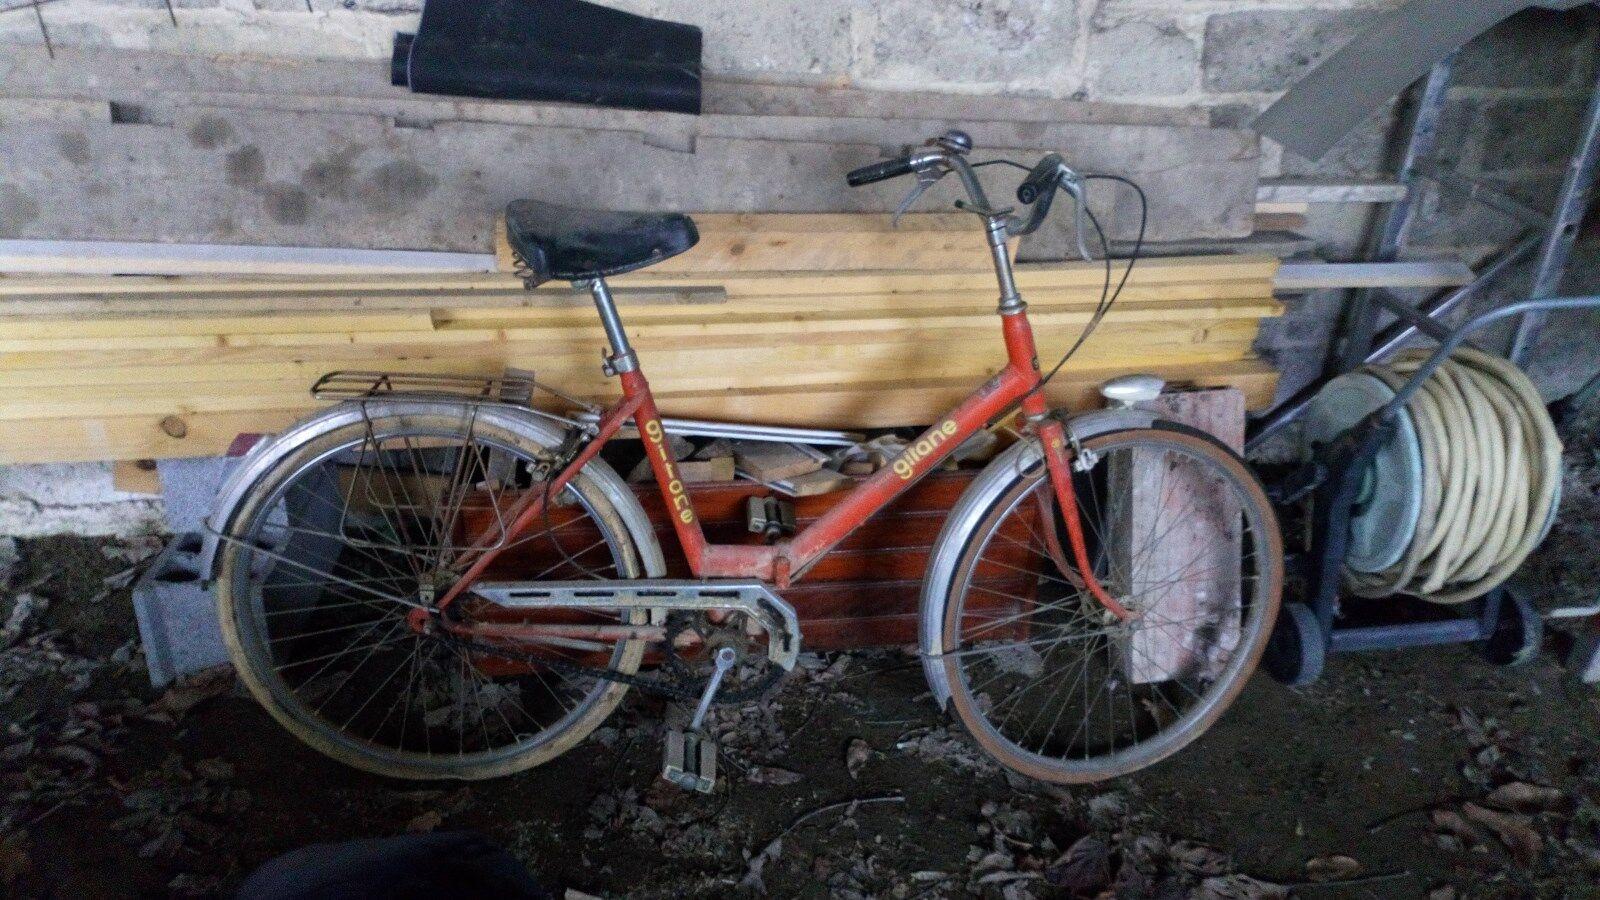 Ancien mini vélo pliable PLICYCLETTE GITANE naranja vintage 70 rétro 1970